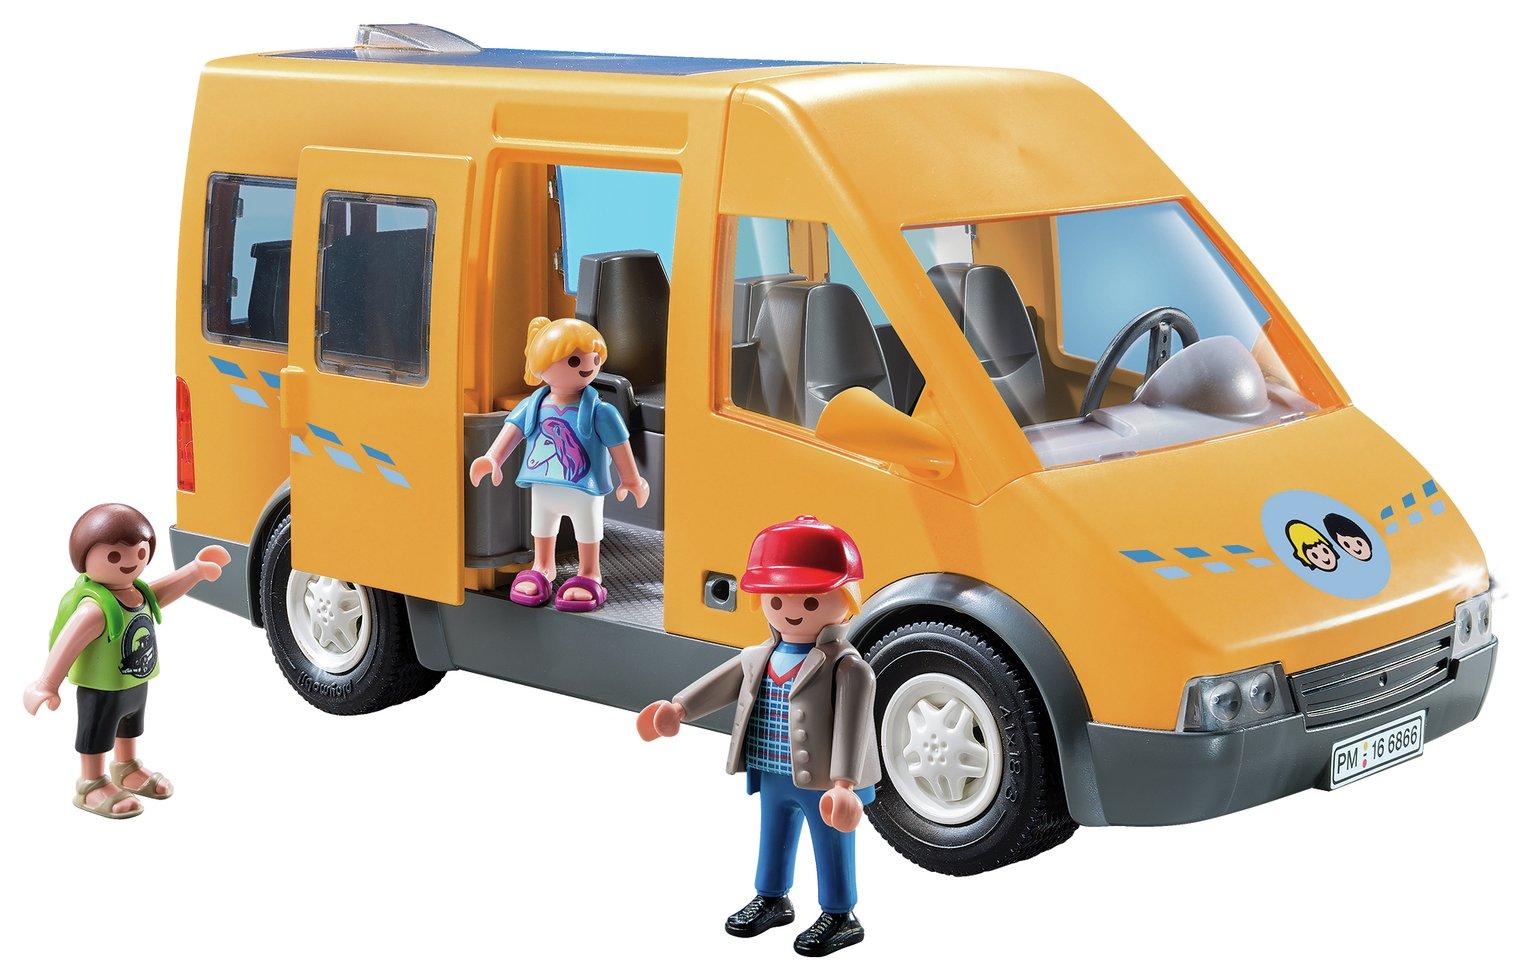 Playmobil 6866 City Life School Bus